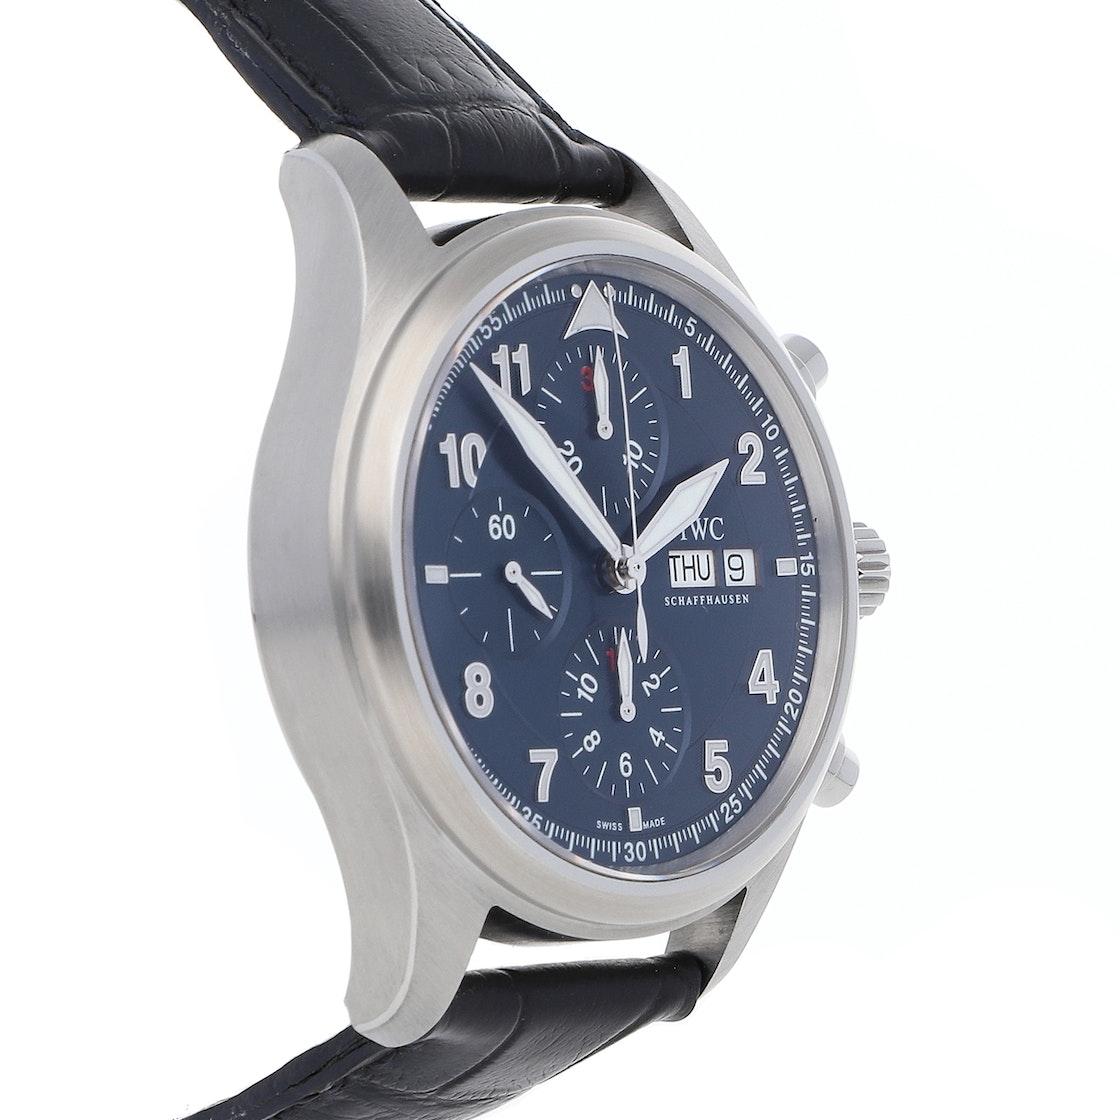 IWC Pilot's Watch Spitfire Chronograph Laureus Limited Editon IW3717-12